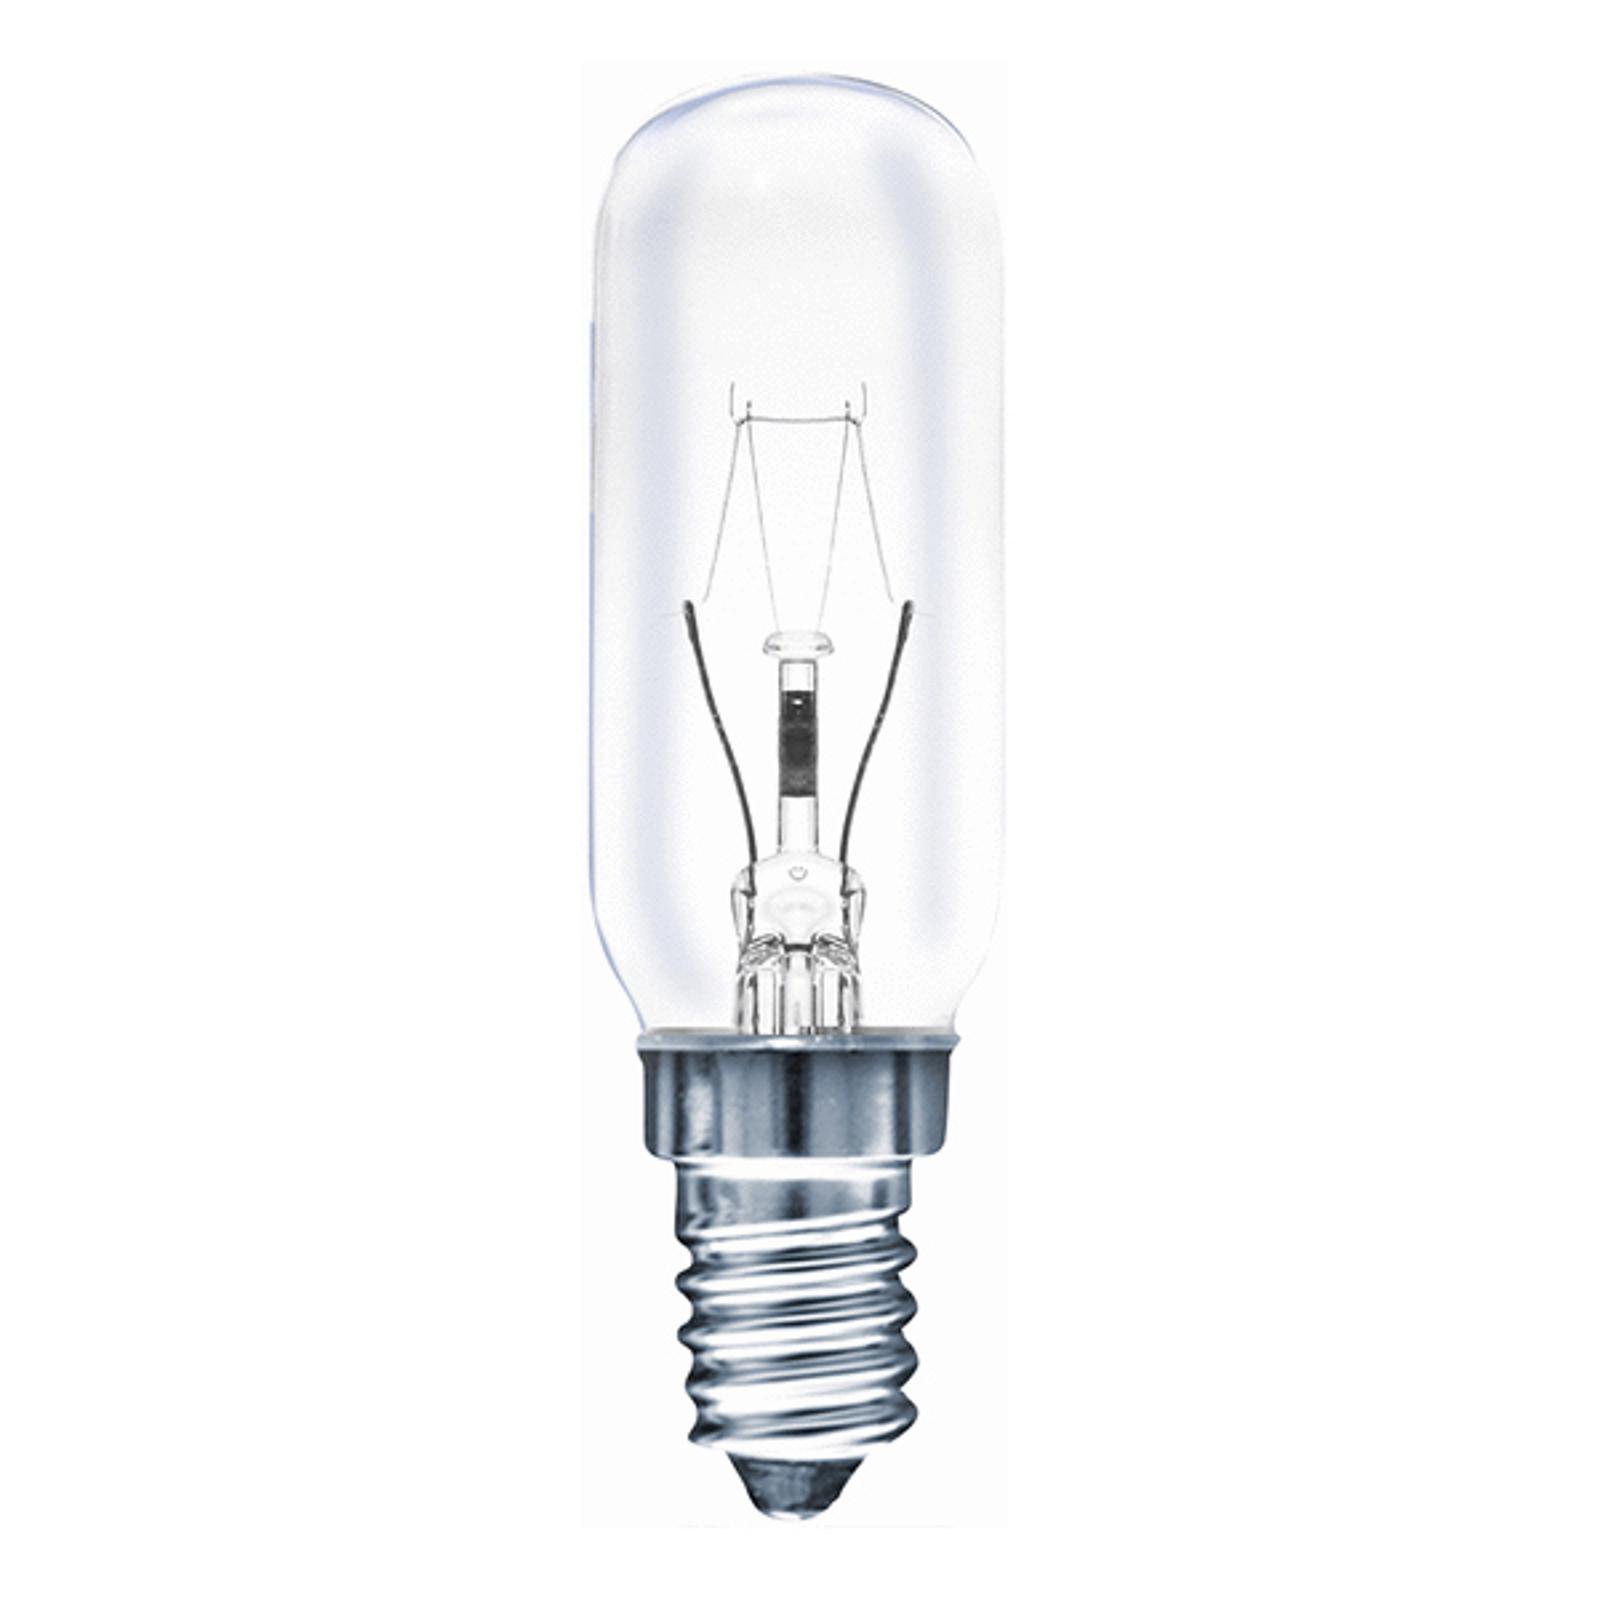 E14 40W Röhrenlampe klar, warmweiß